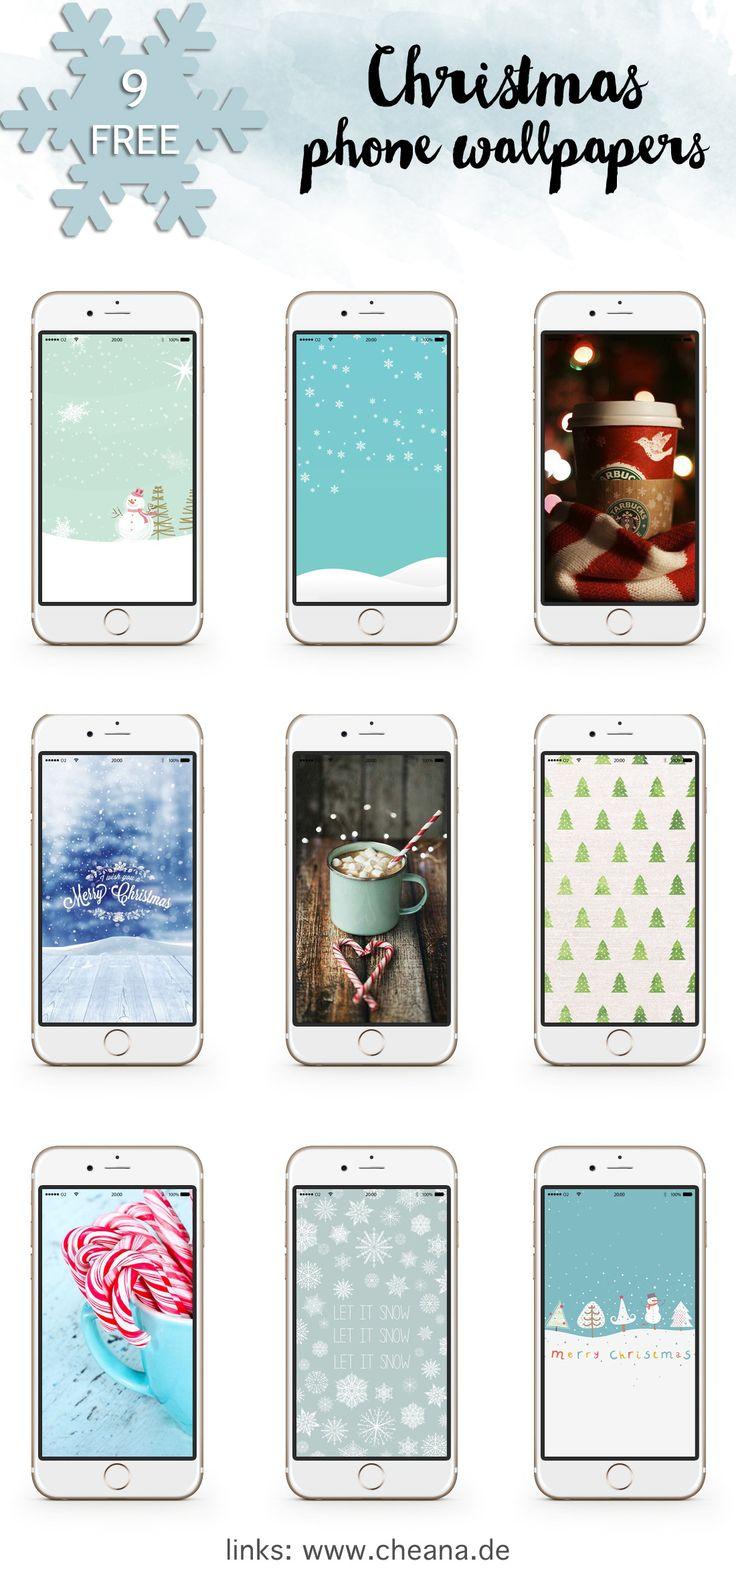 9 kostenlose Hintergrundbilder für euer Smartphone | 9 free Christmas Wallpapers for iPhone & Android phones